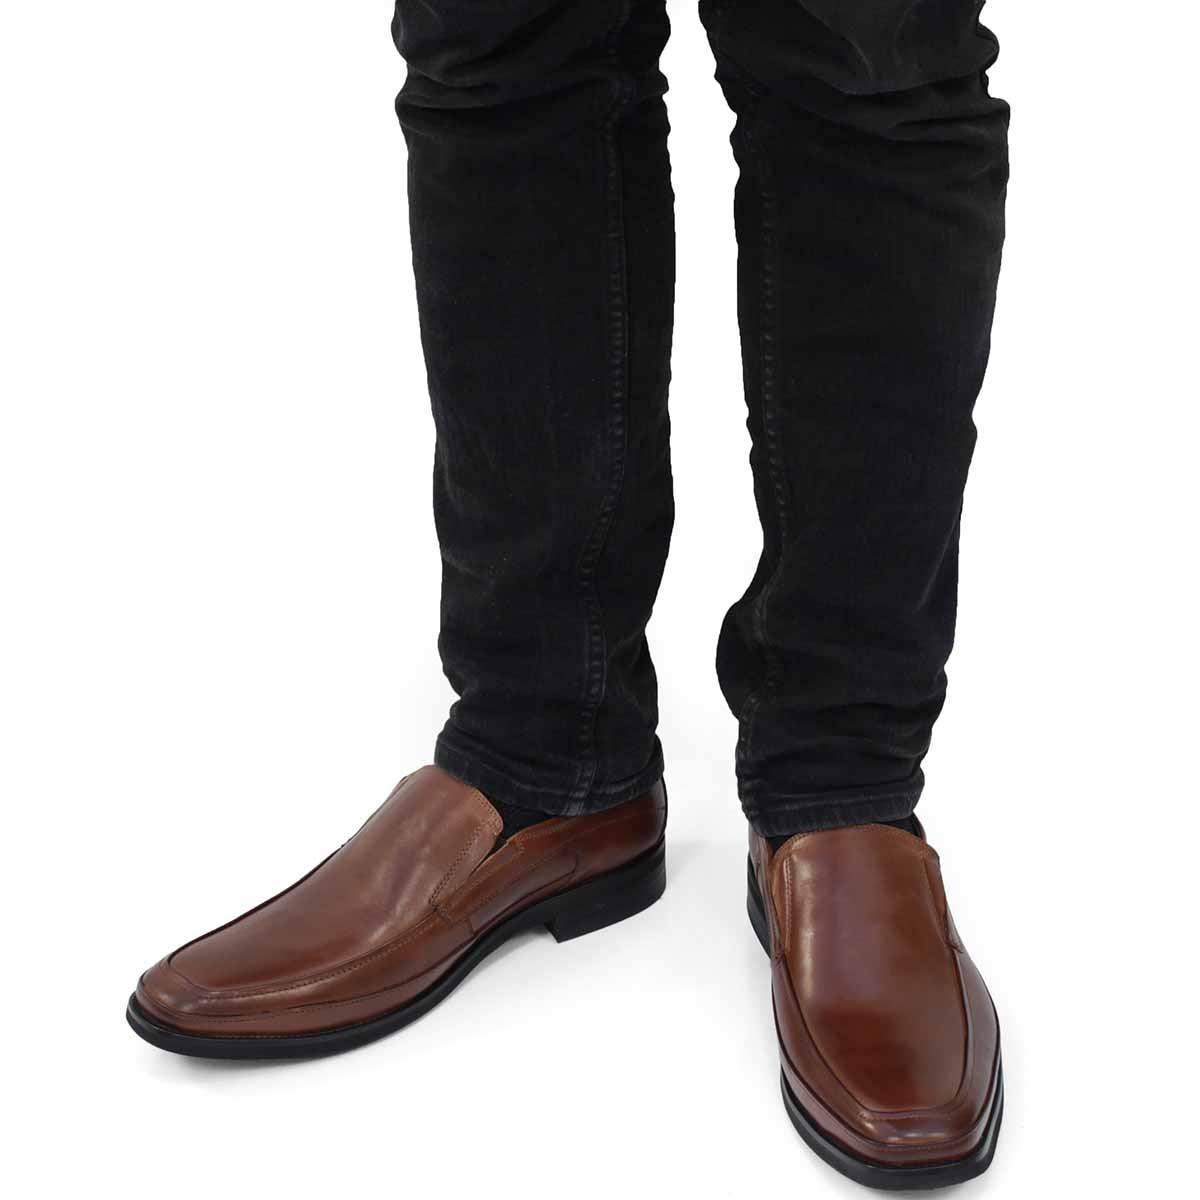 Mns Joseph cognac slip on dress shoe